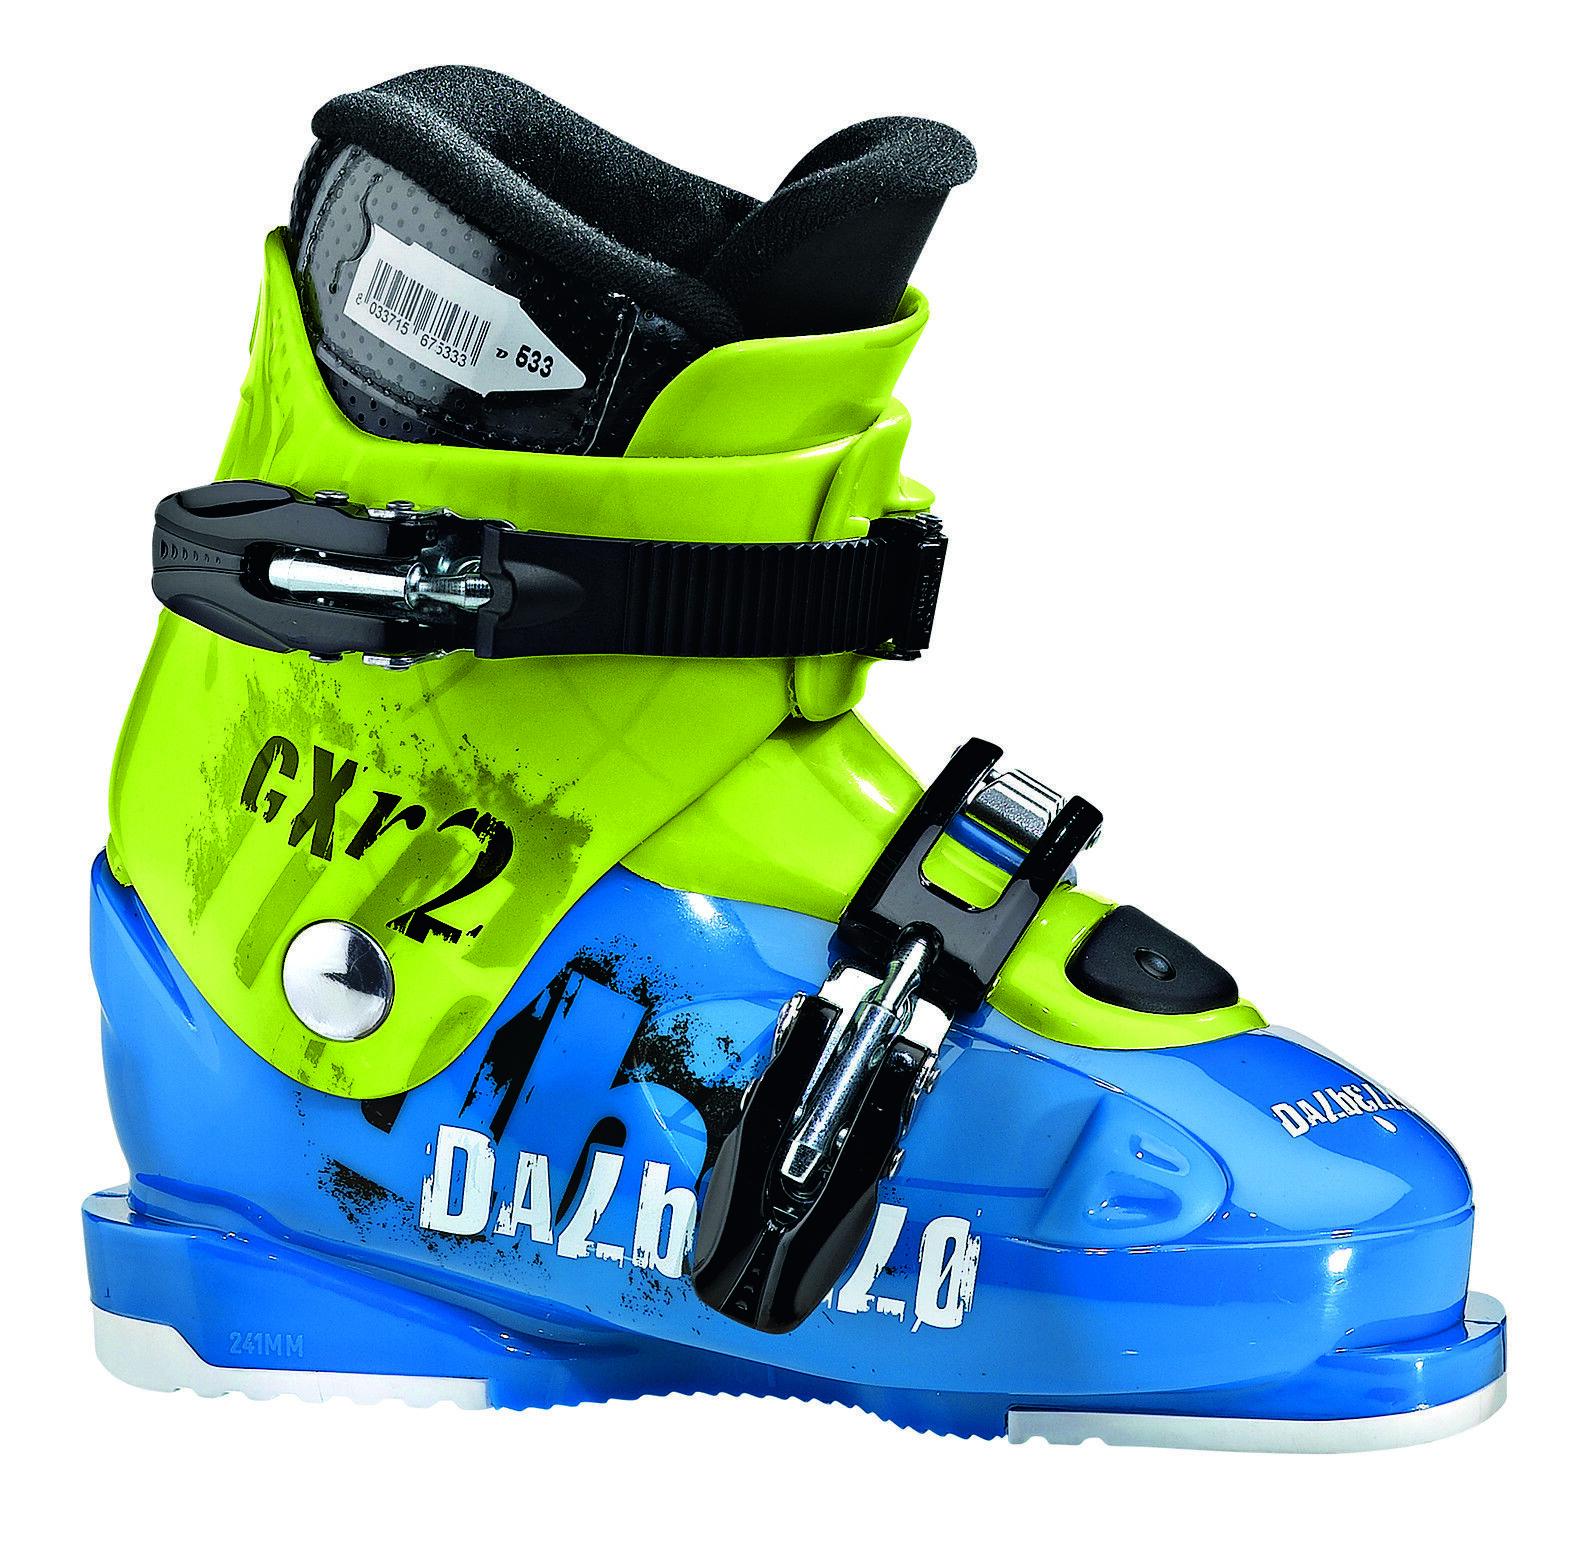 Dalbello RTL-CXR 2 Stiefel Jr - Kinder Skischuh Ski Stiefel 2 - DRC2J6.BA 3f5c03